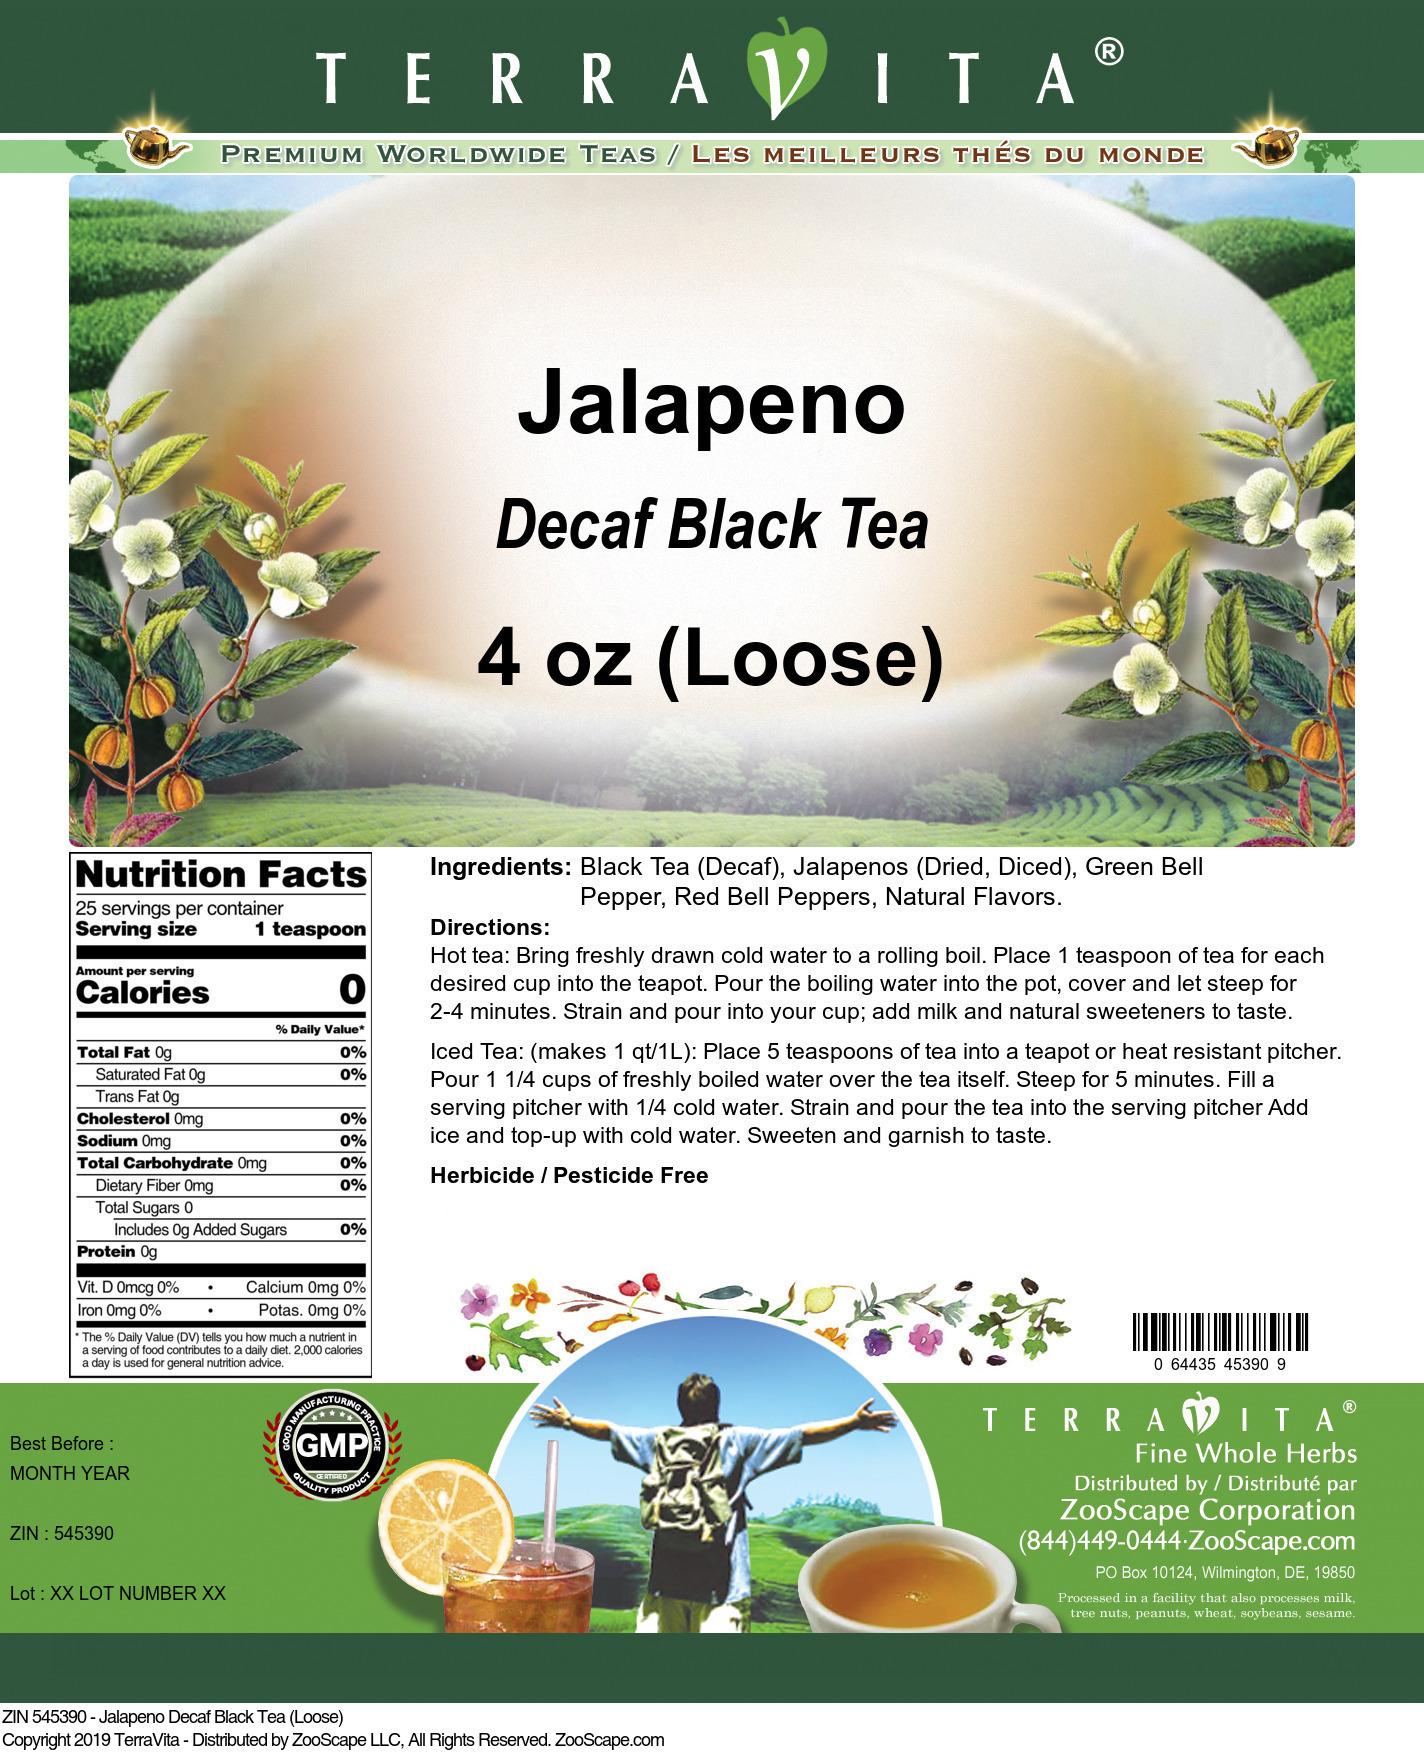 Jalapeno Decaf Black Tea (Loose)